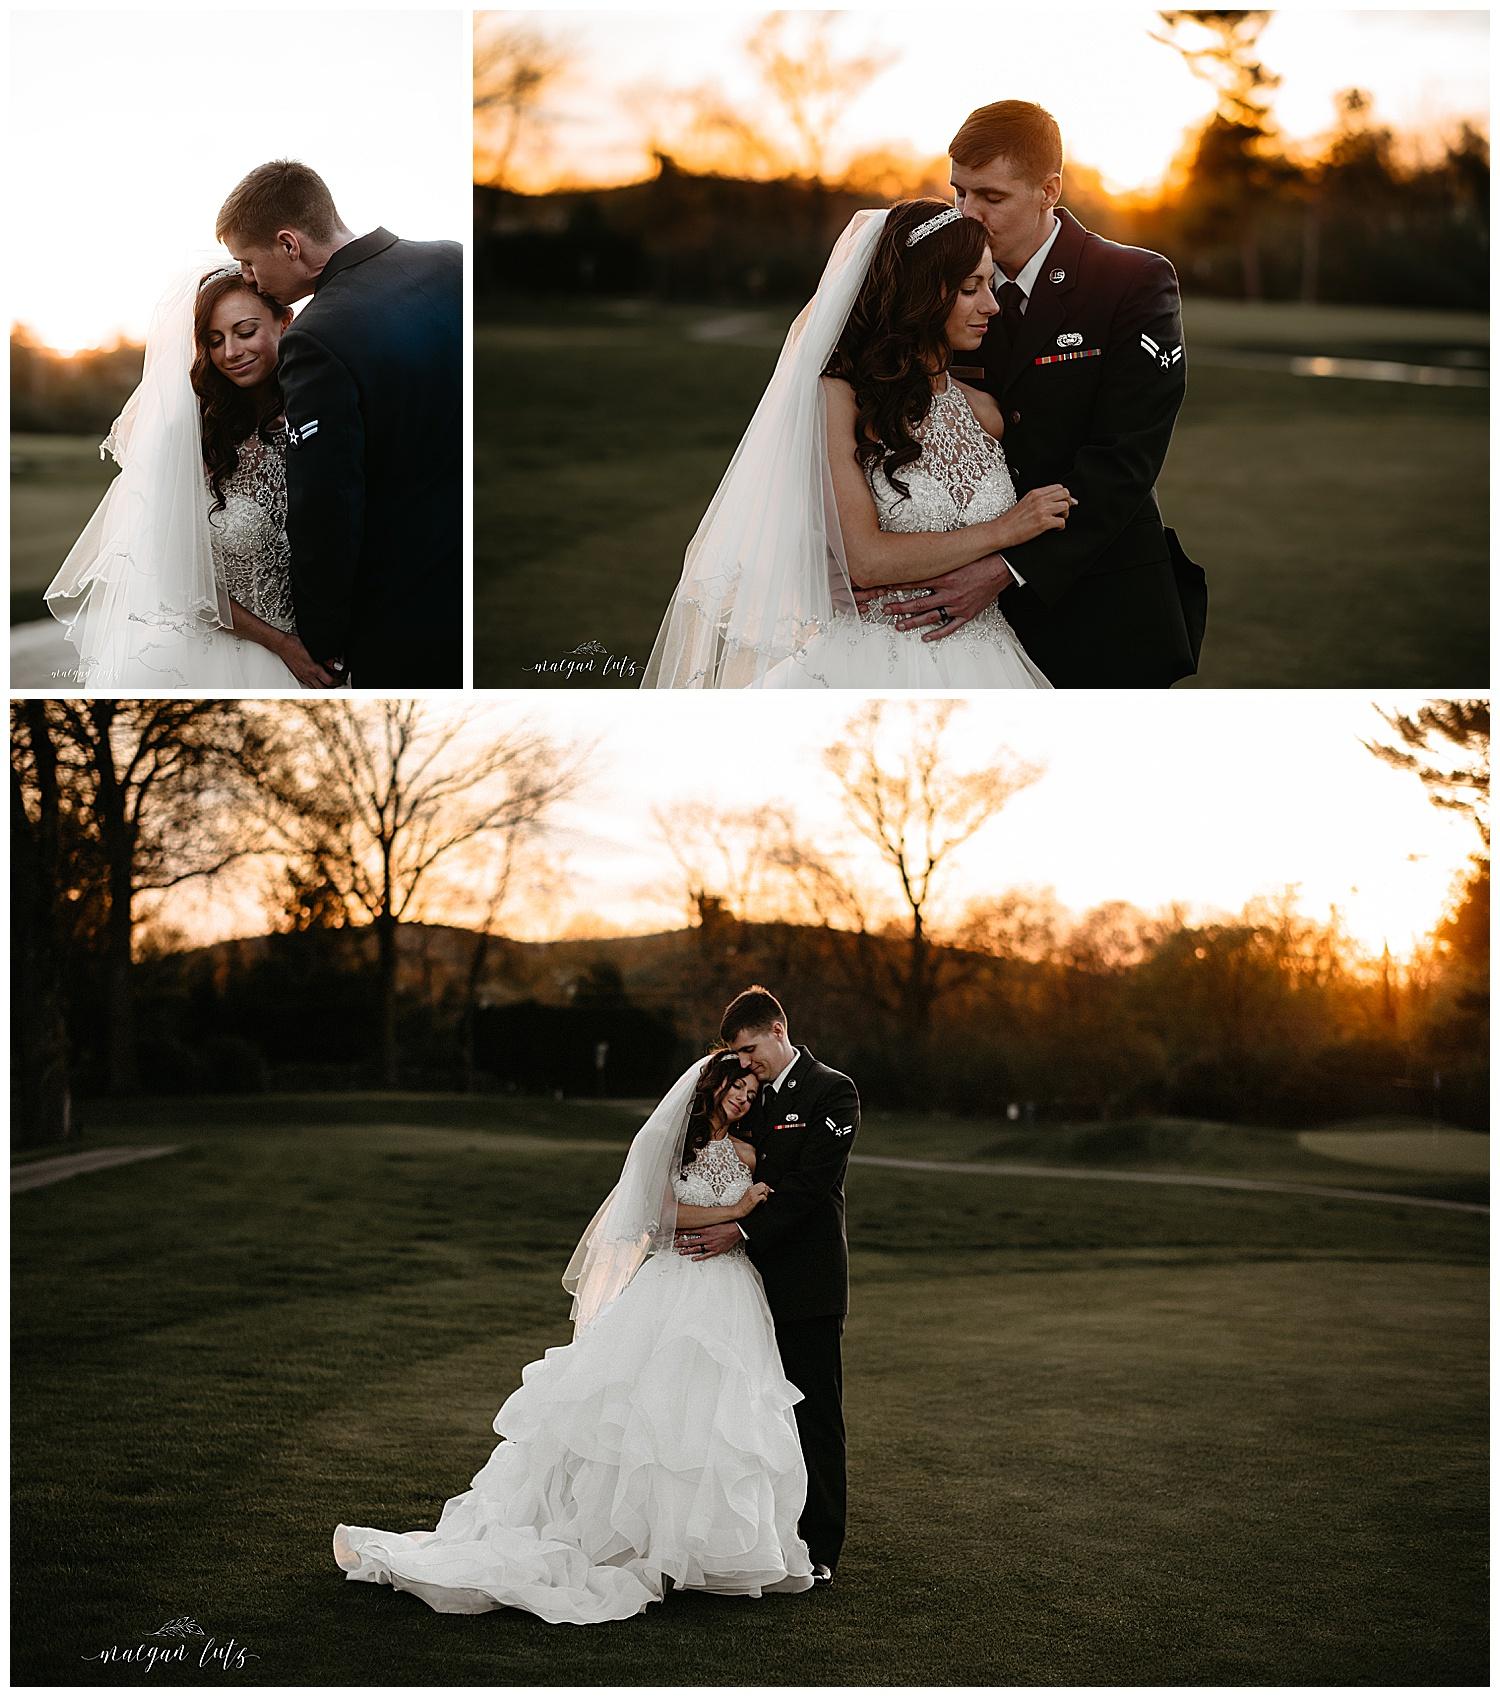 NEPA-Lehigh-Valley-Wedding-Photographer-at-Glen-Oak-Country-Club-Clarks-Summit-PA_0065.jpg